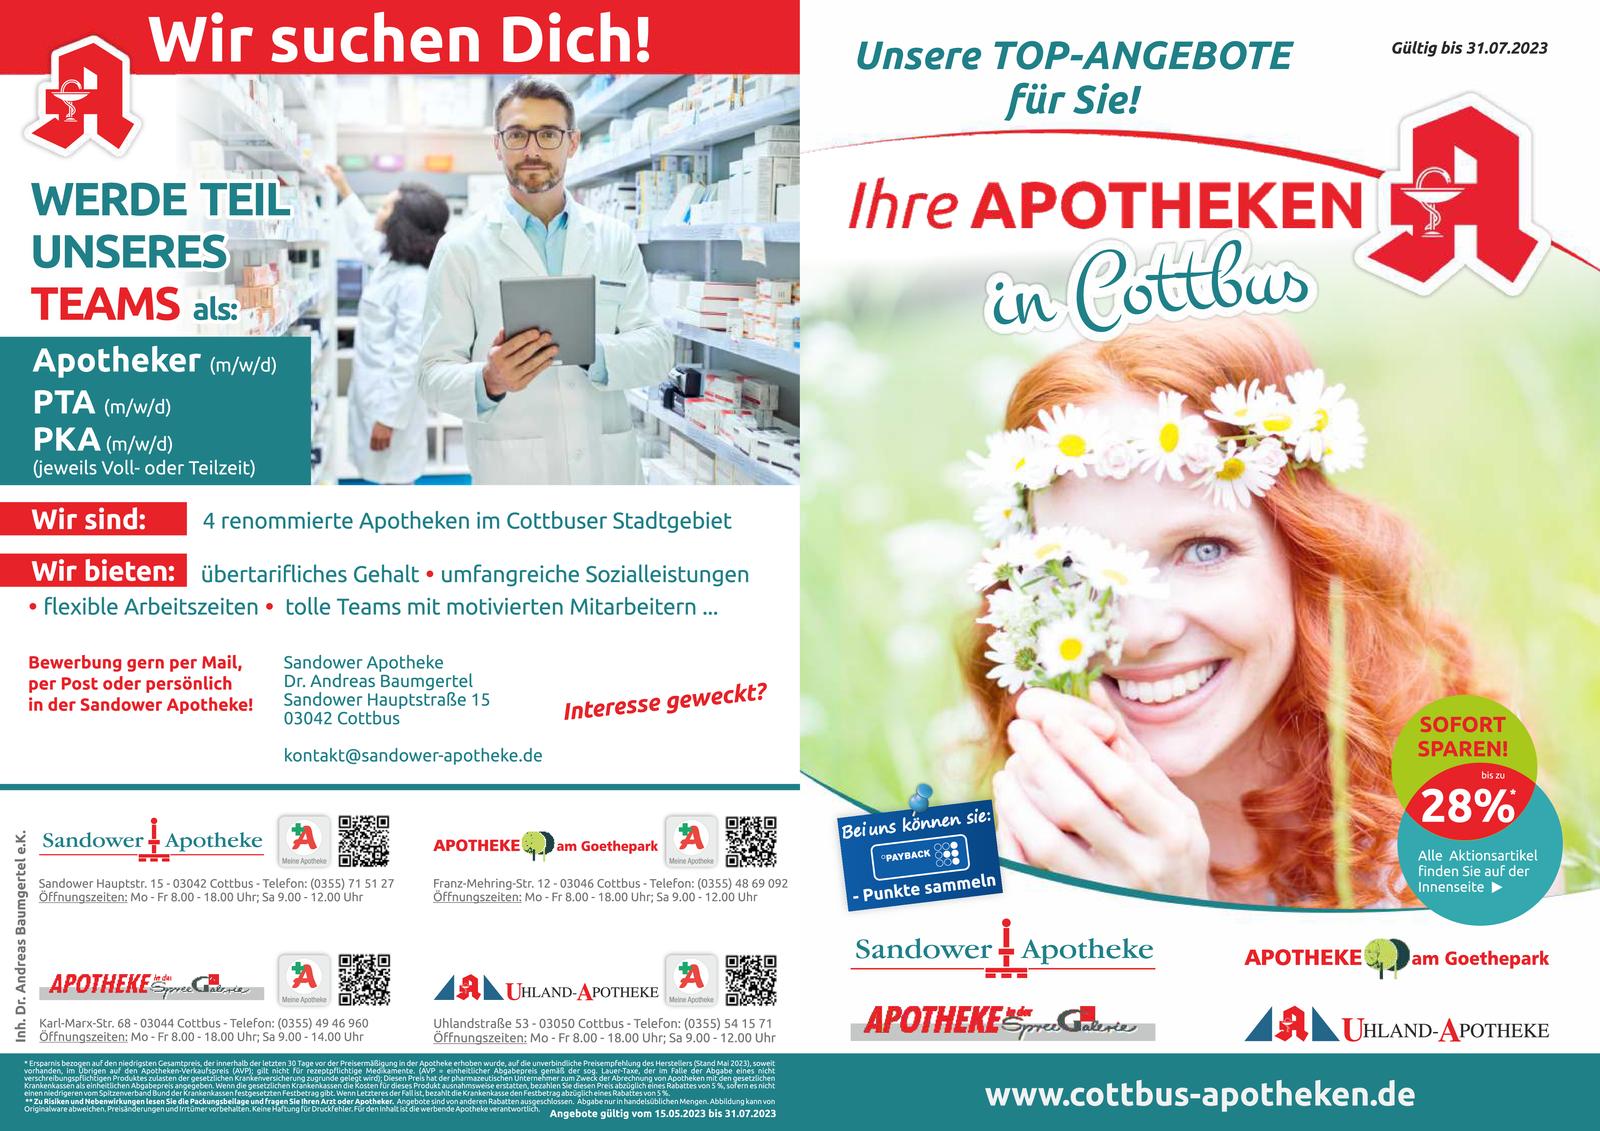 https://mein-uploads.apocdn.net/1274/leaflets/1274_flyer-Seite1.png